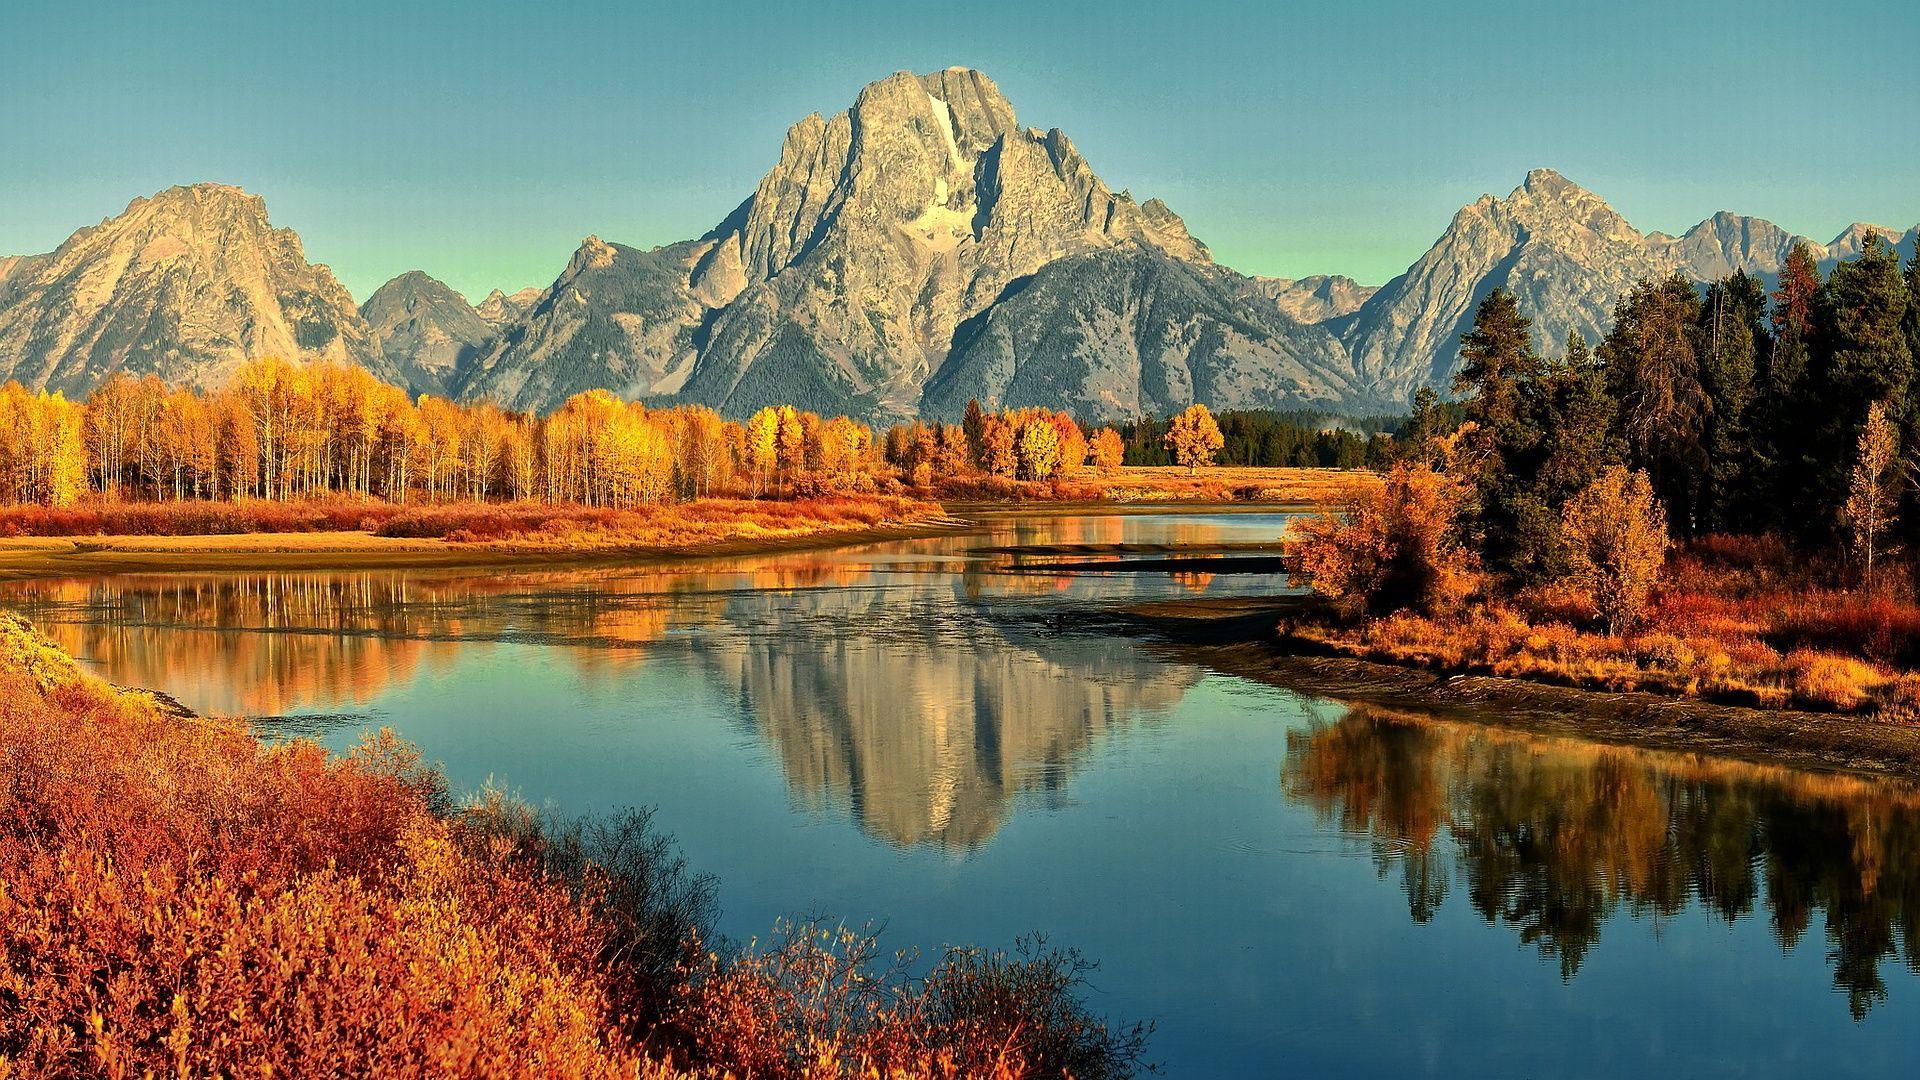 45 Autumn Mountains Desktop Wallpapers   Download at WallpaperBro 1920x1080